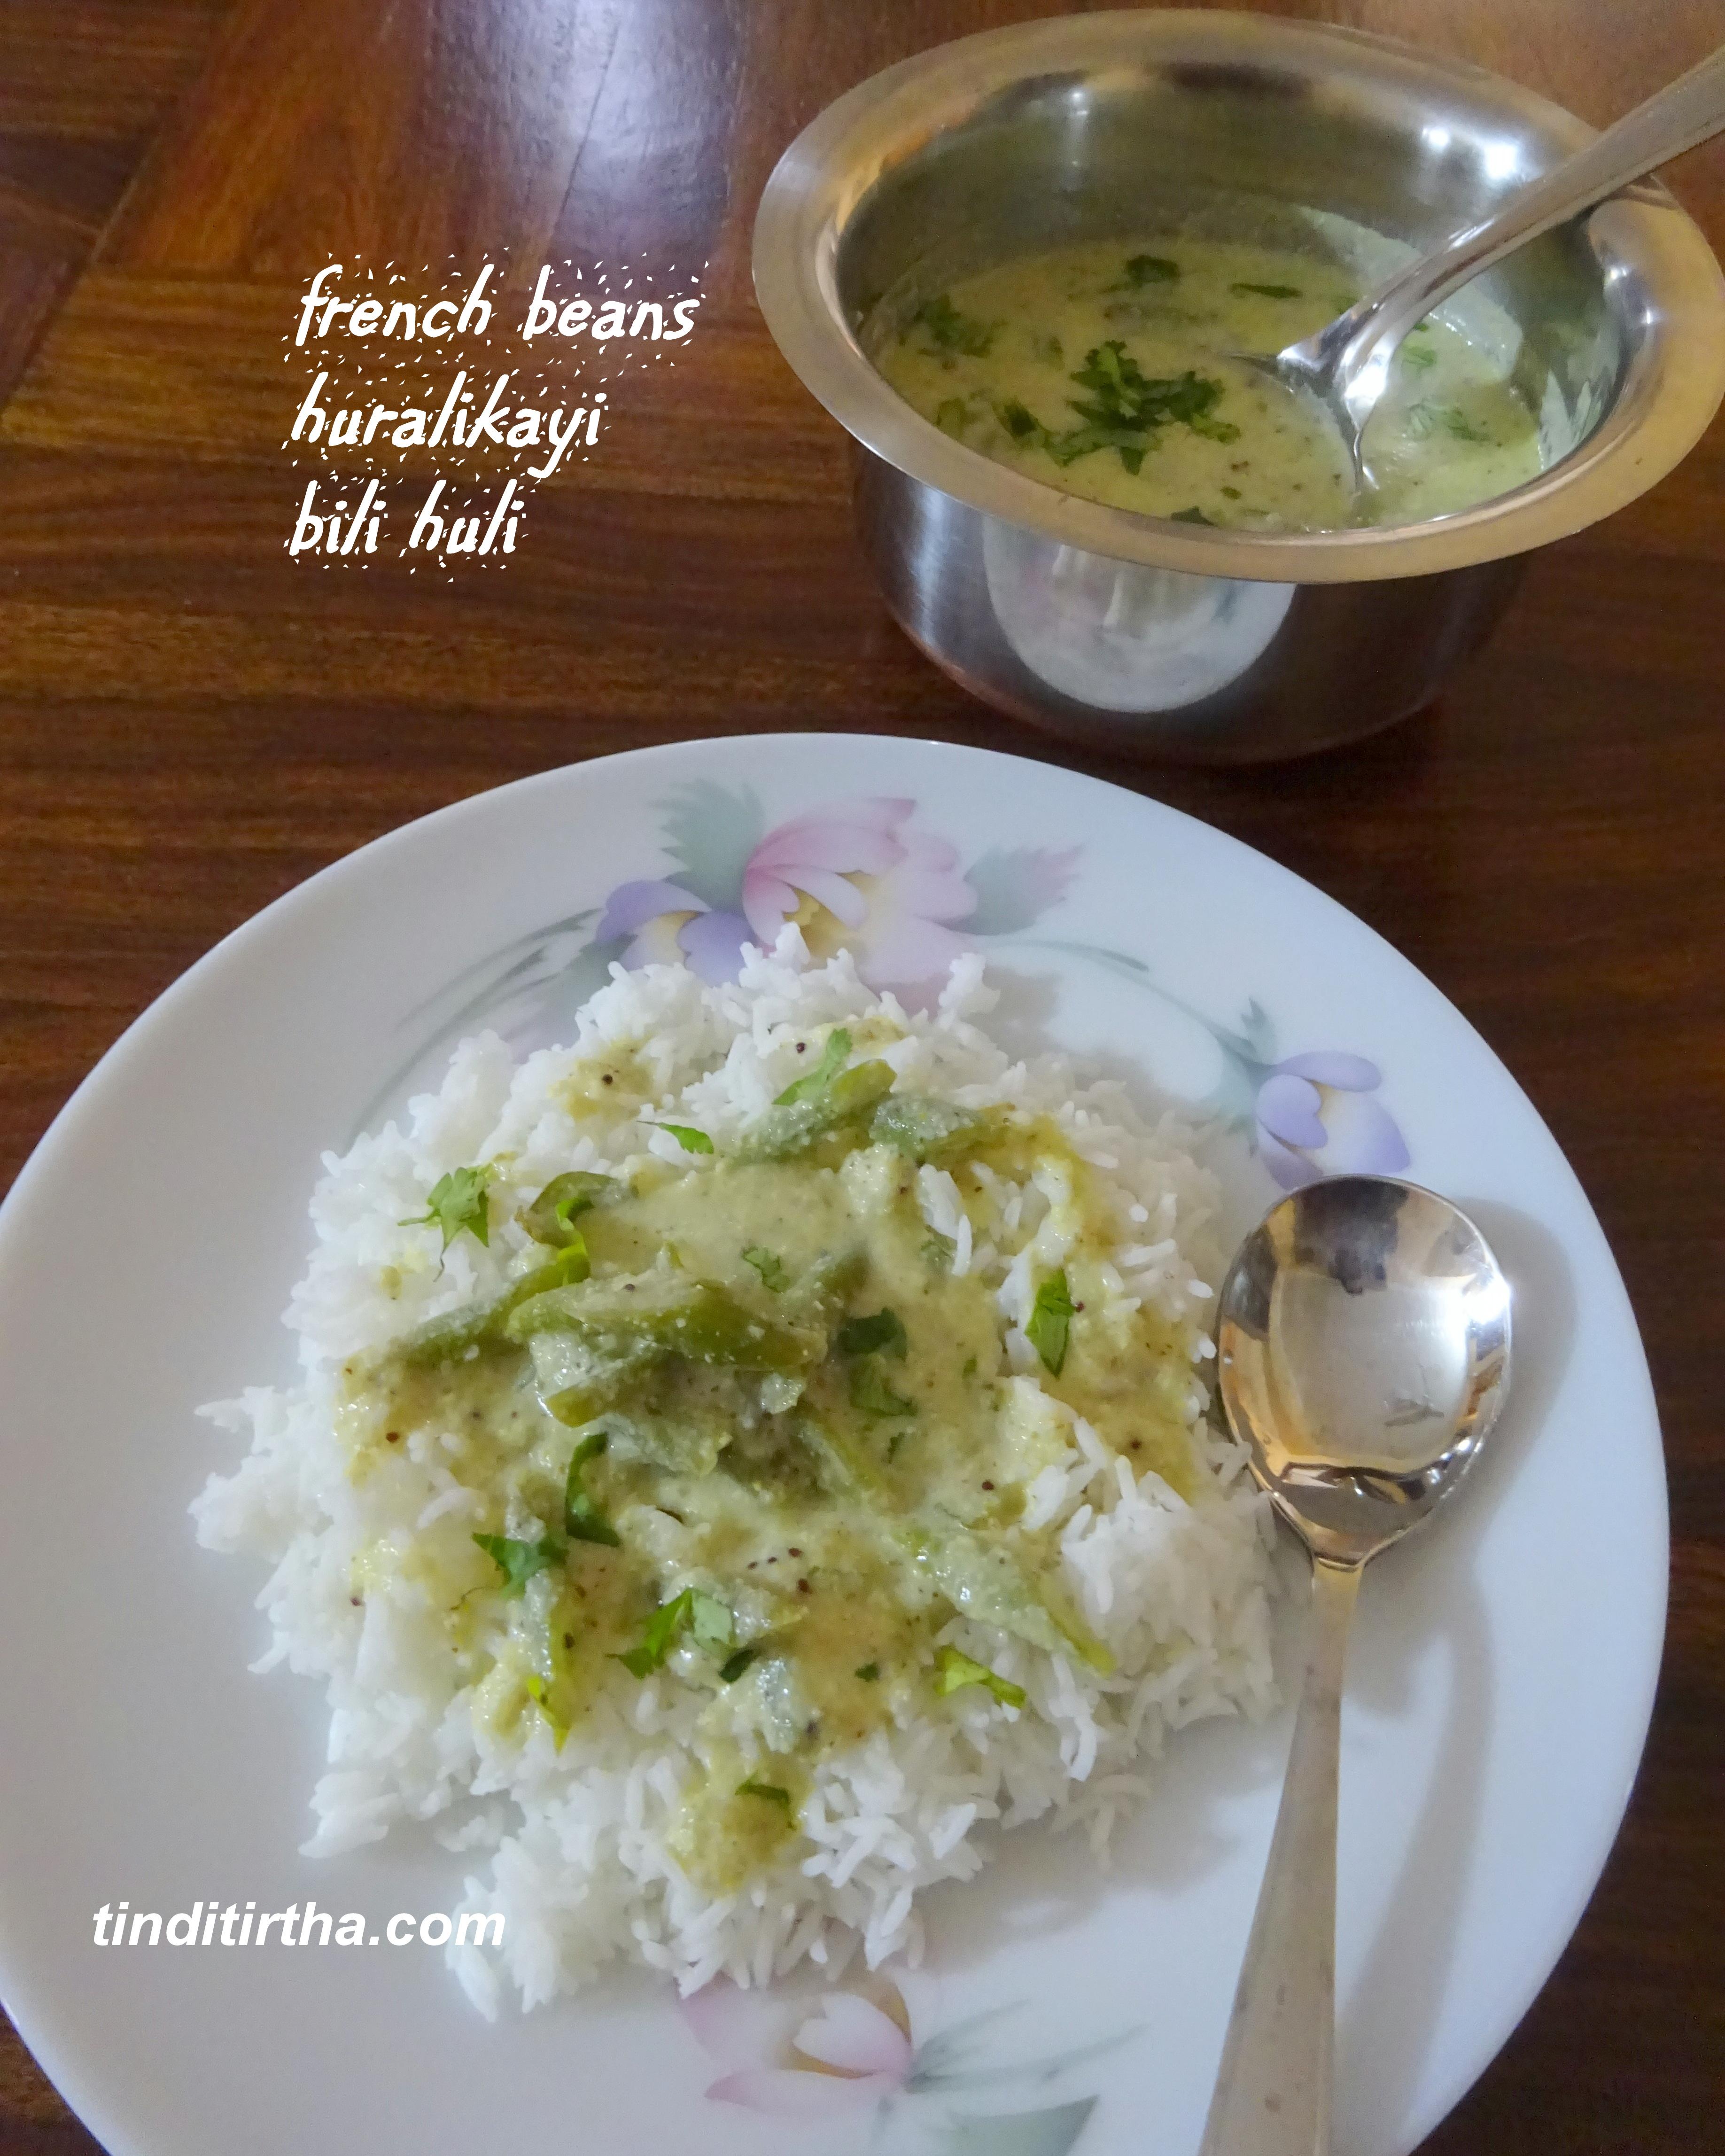 HURALIKAYI BILI HULI……. lentil less white colored sambar using french beans